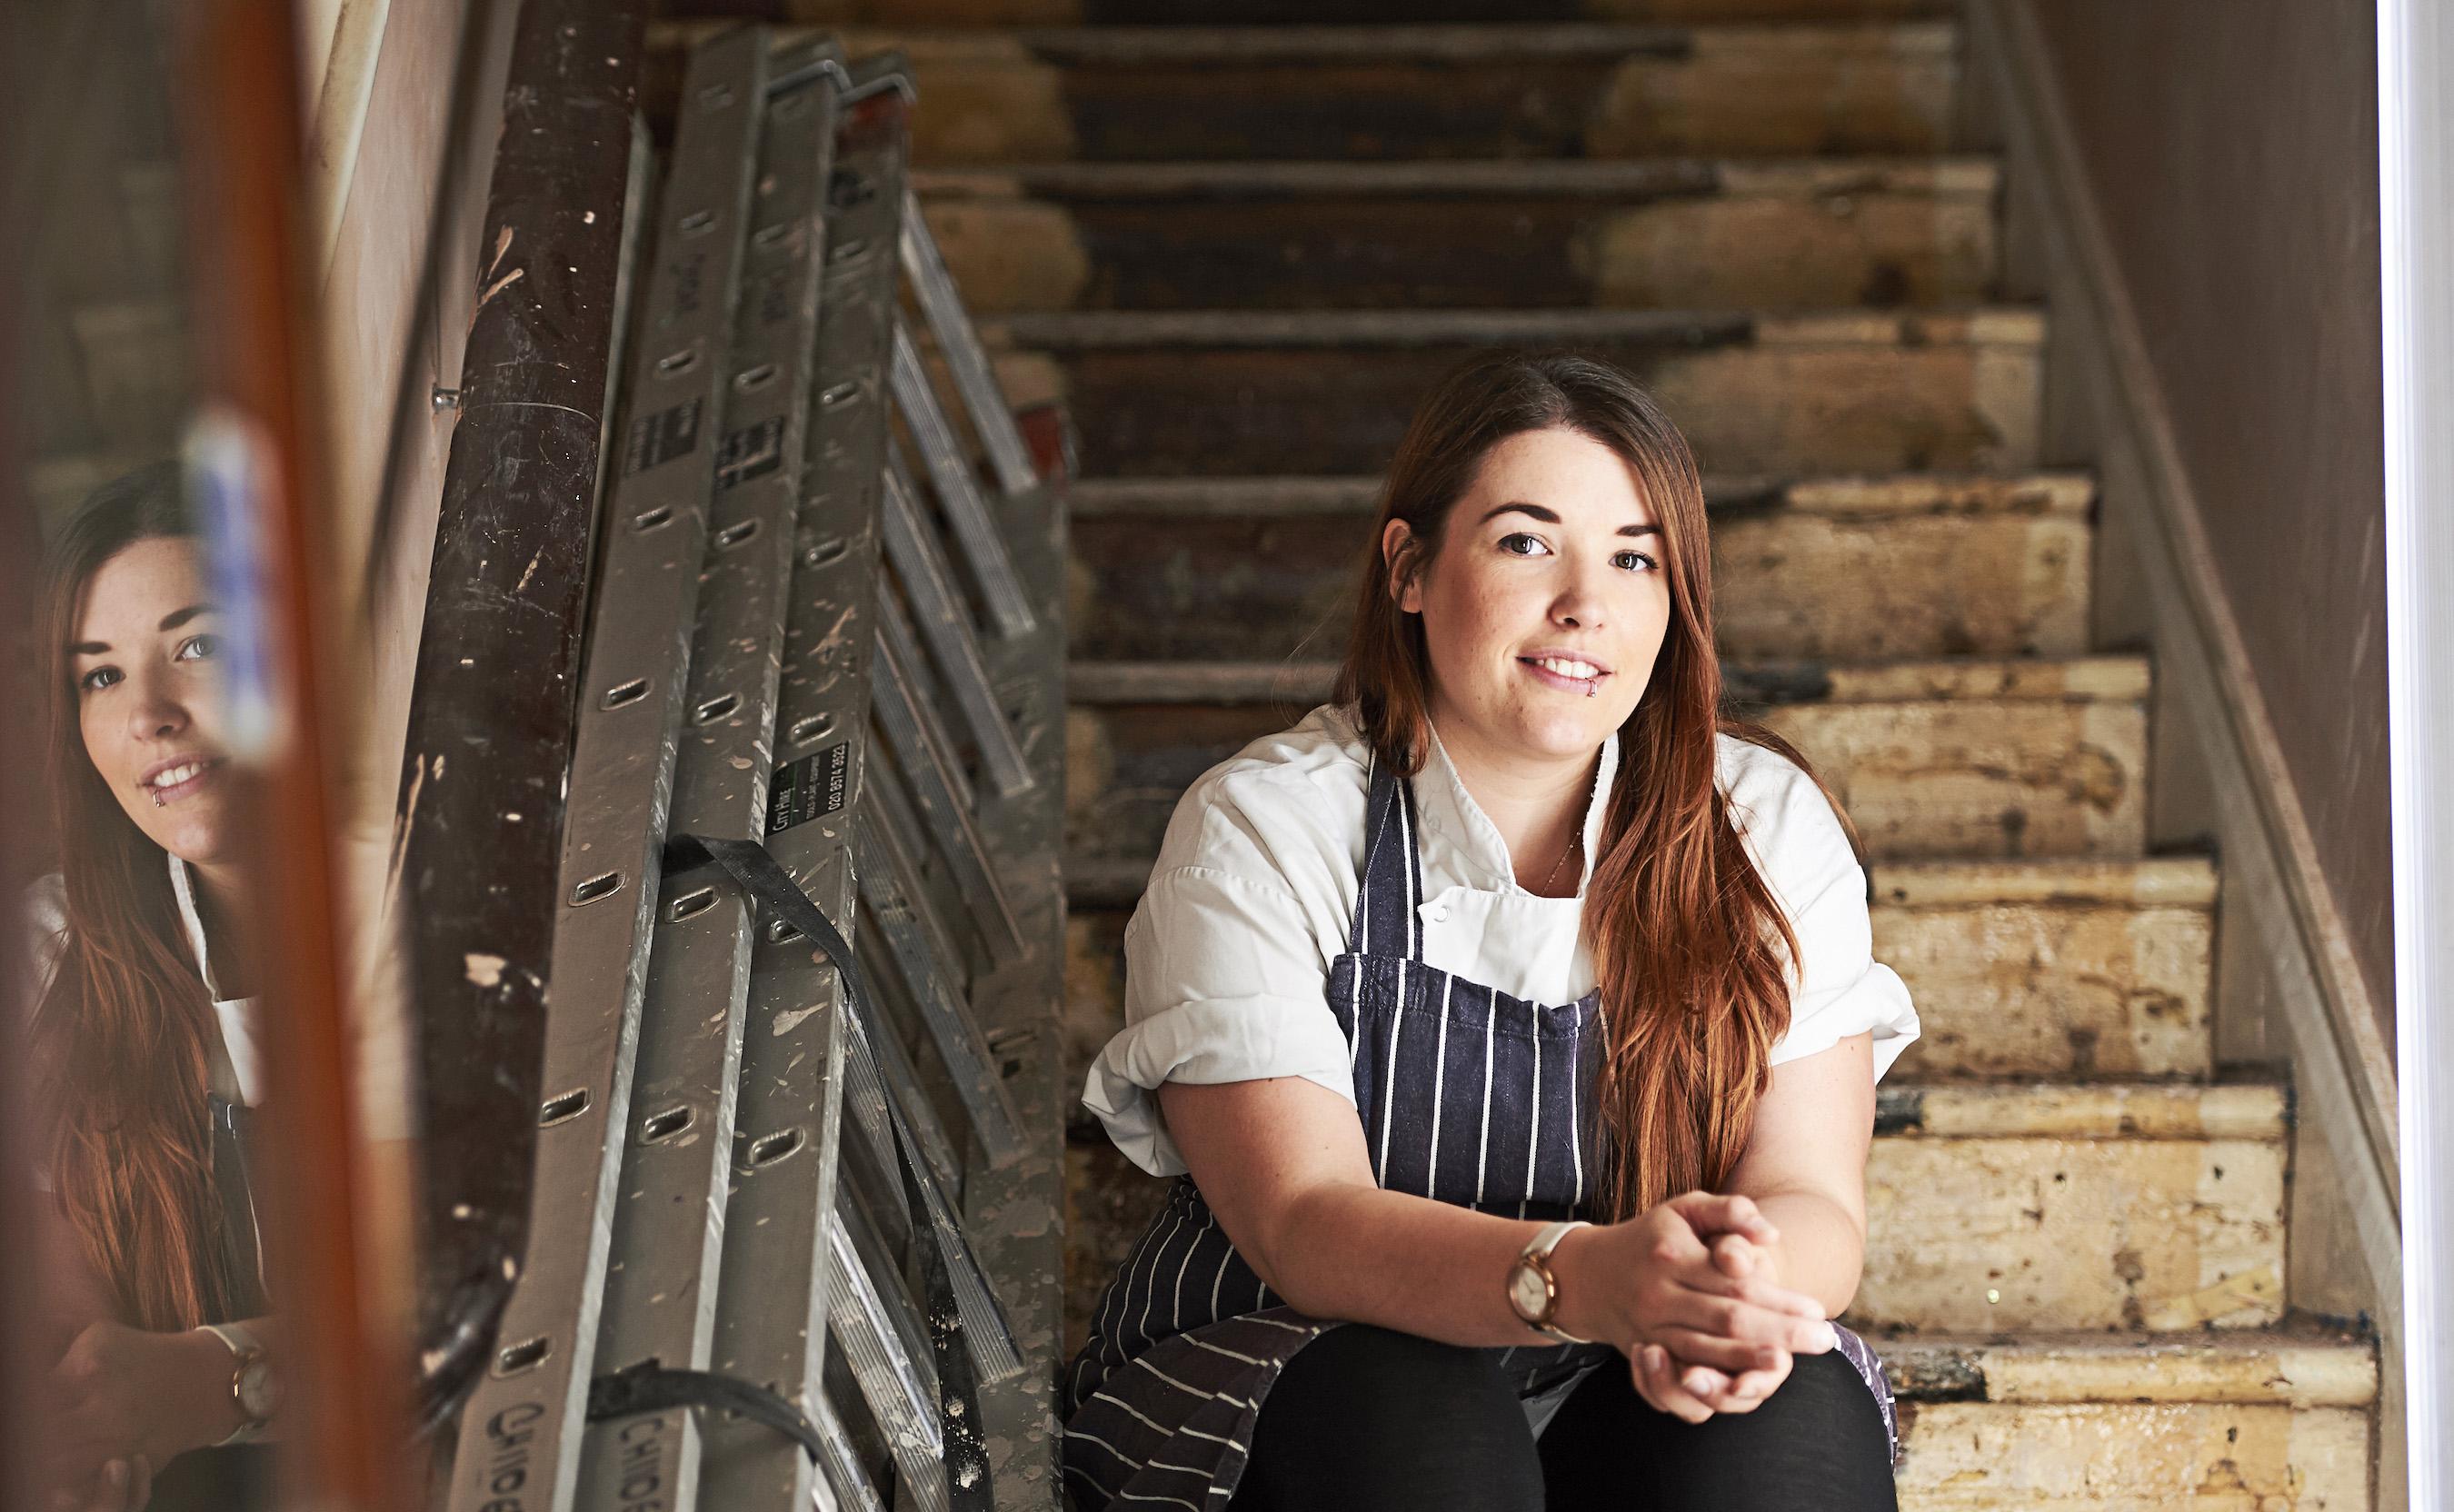 Sara Lewis, head chef of The Pilgrim Hotel. Photo by Thomas Bowles